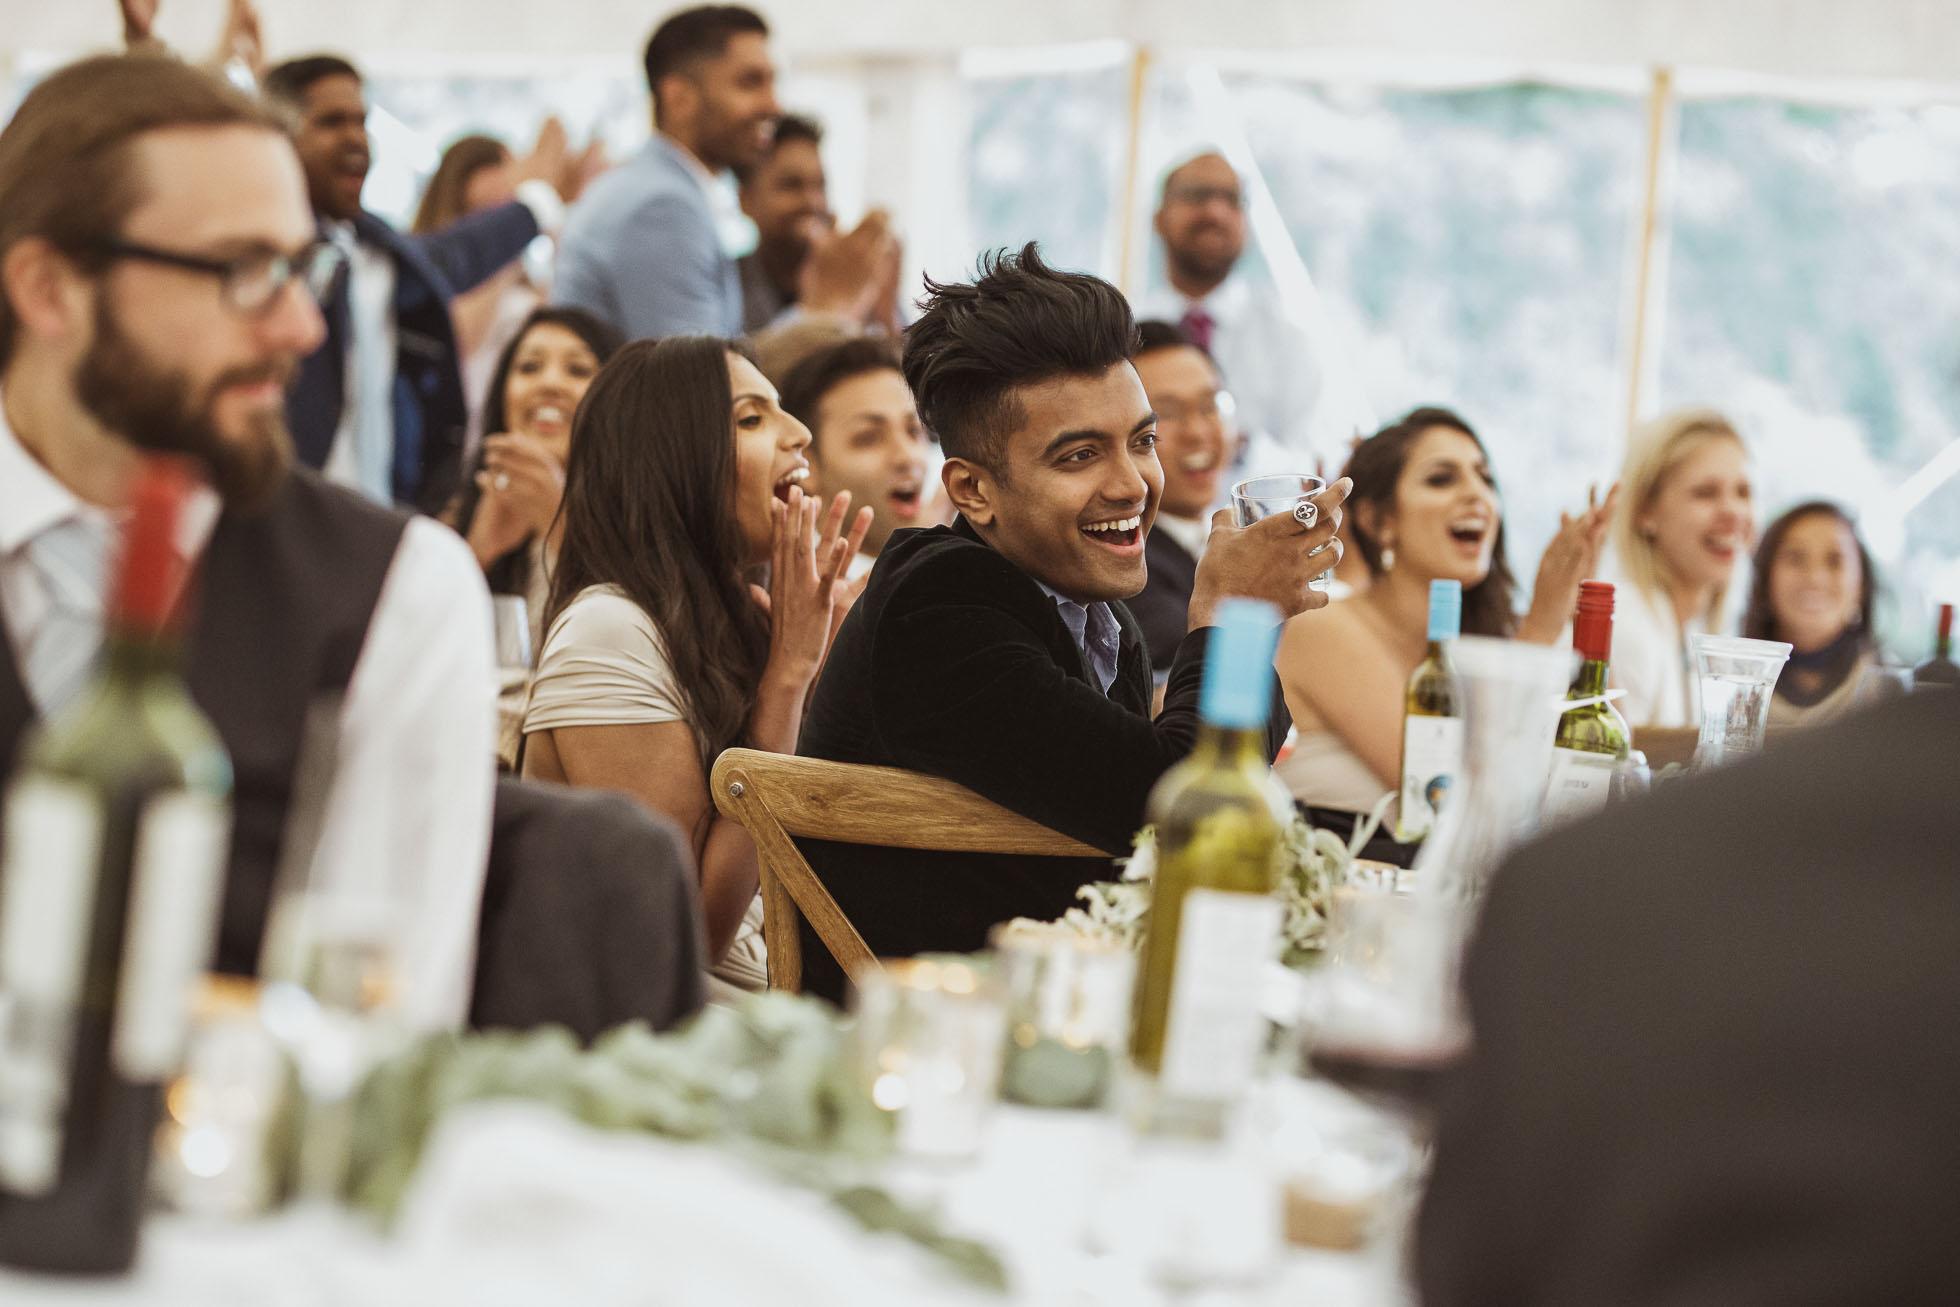 norton_conyers_wedding_photographer-70.jpg